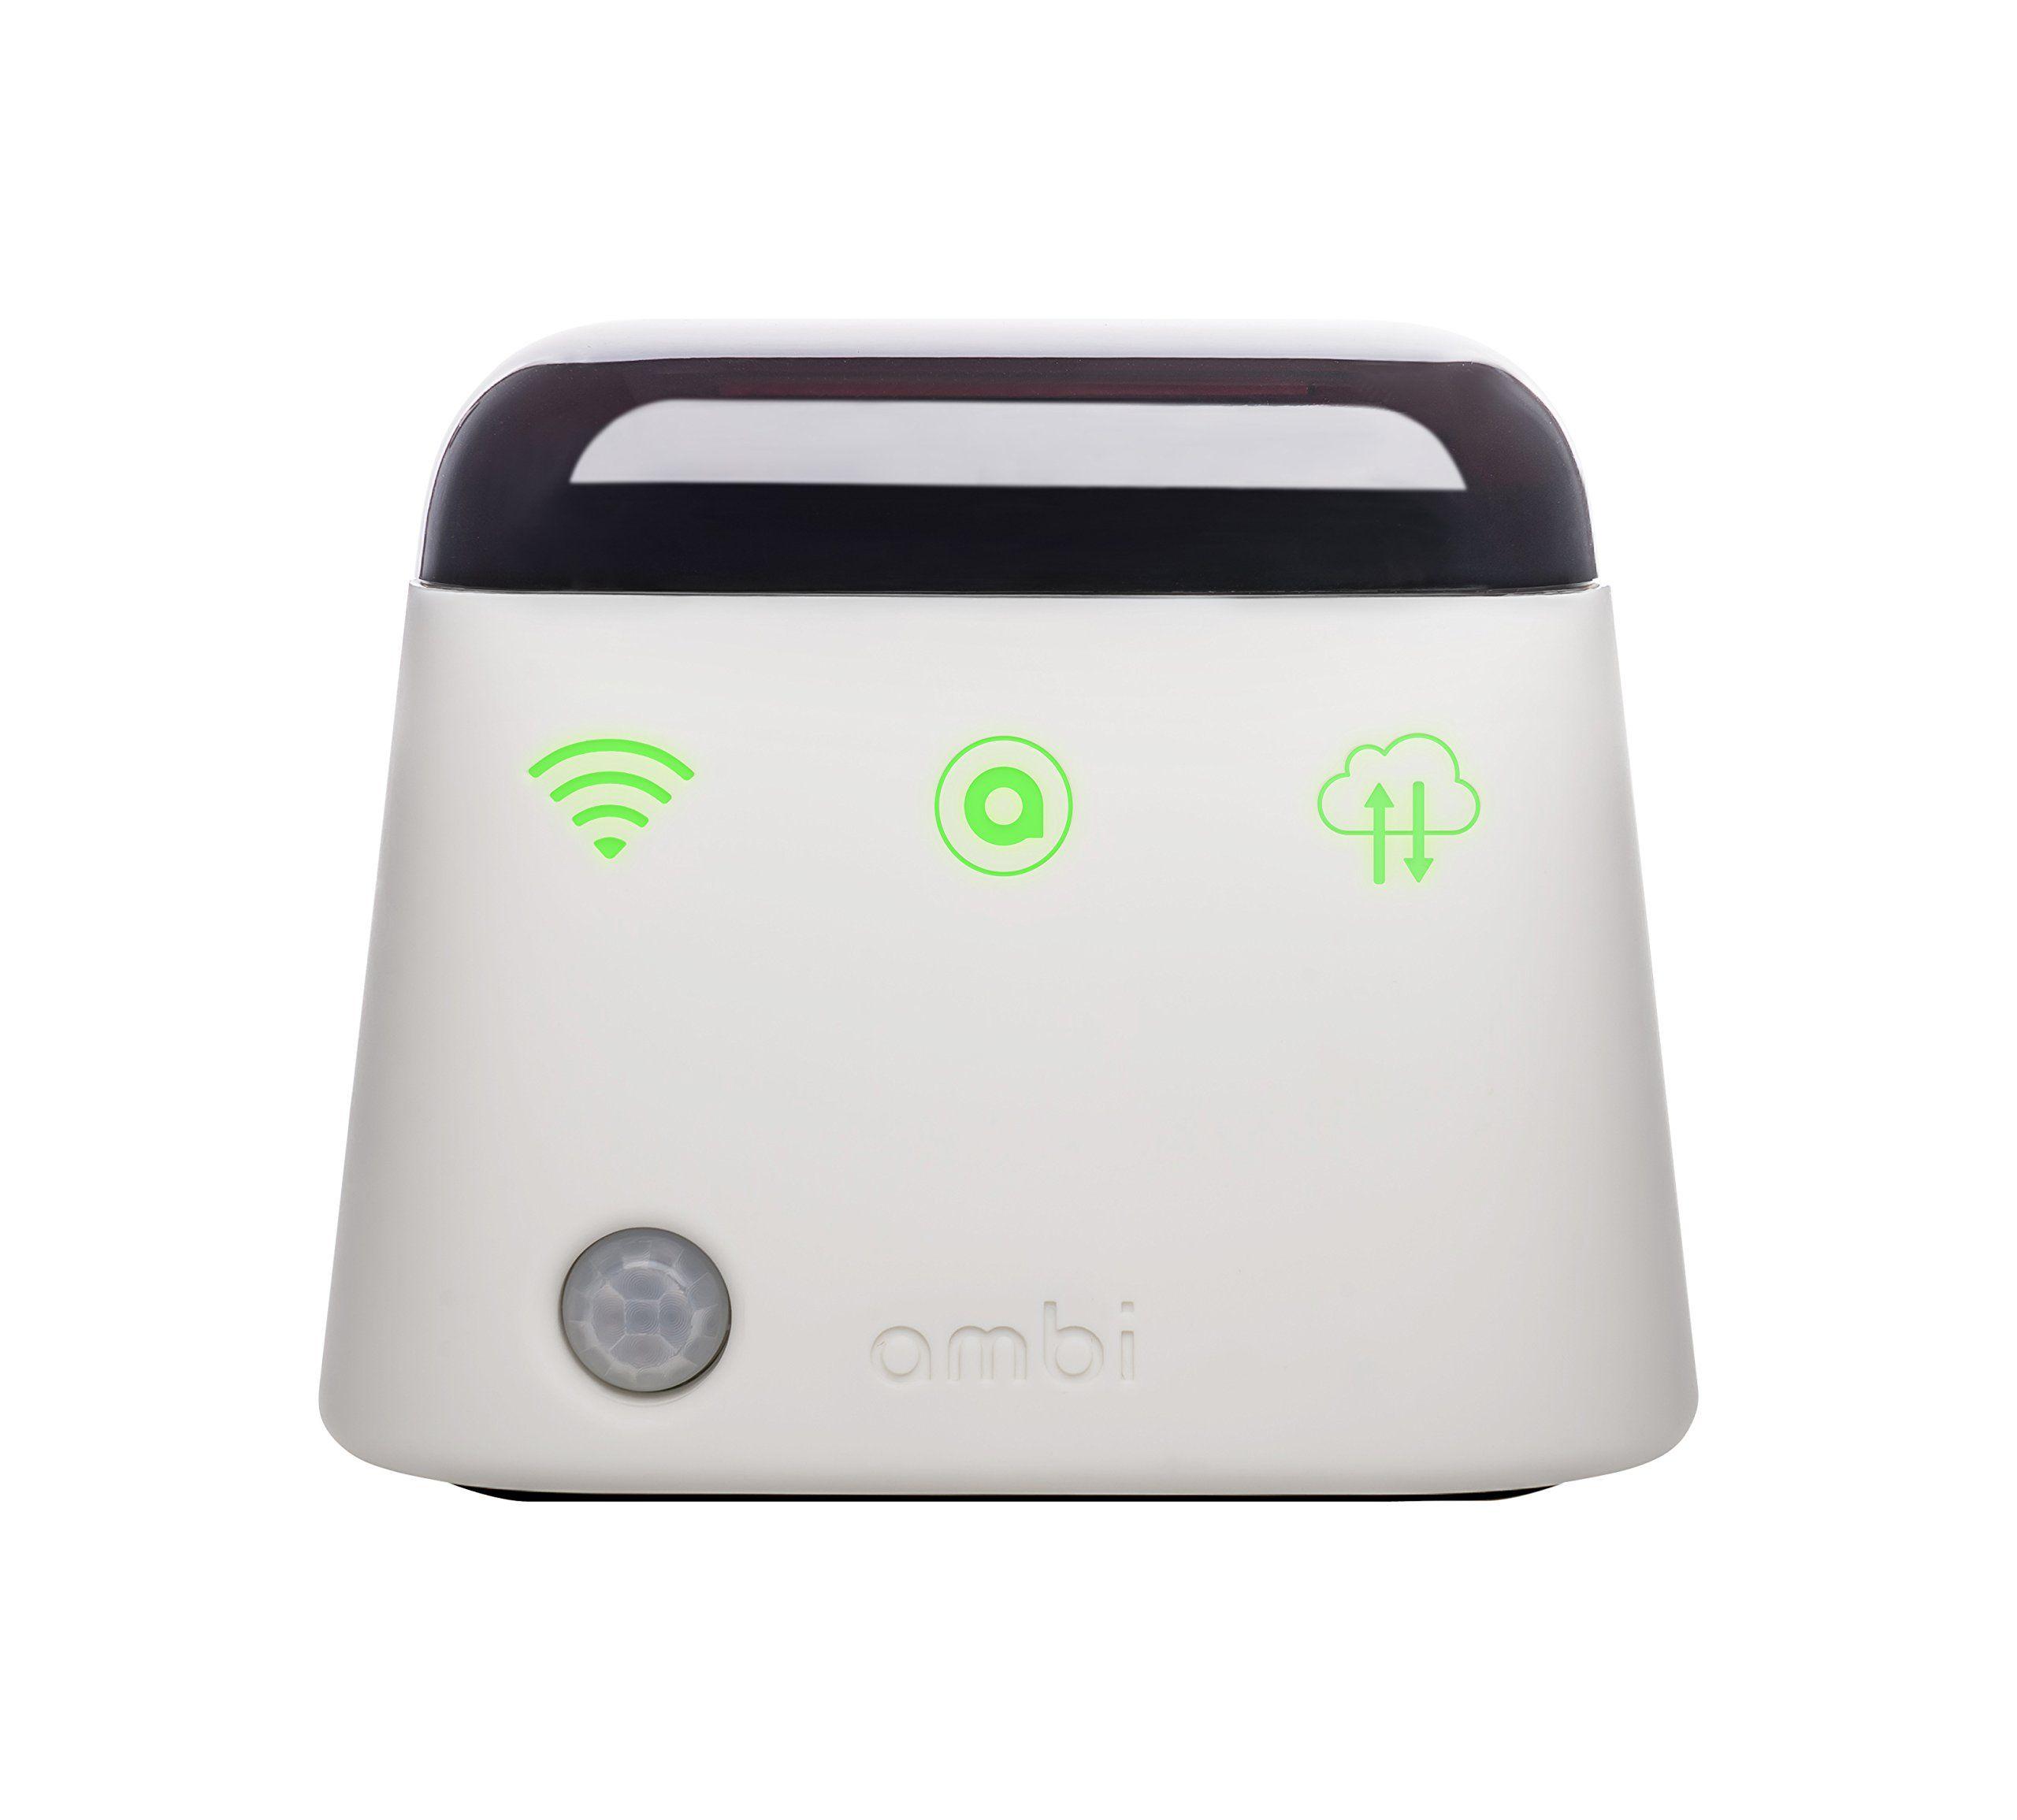 bork eng products smart merged toaster hk tonner